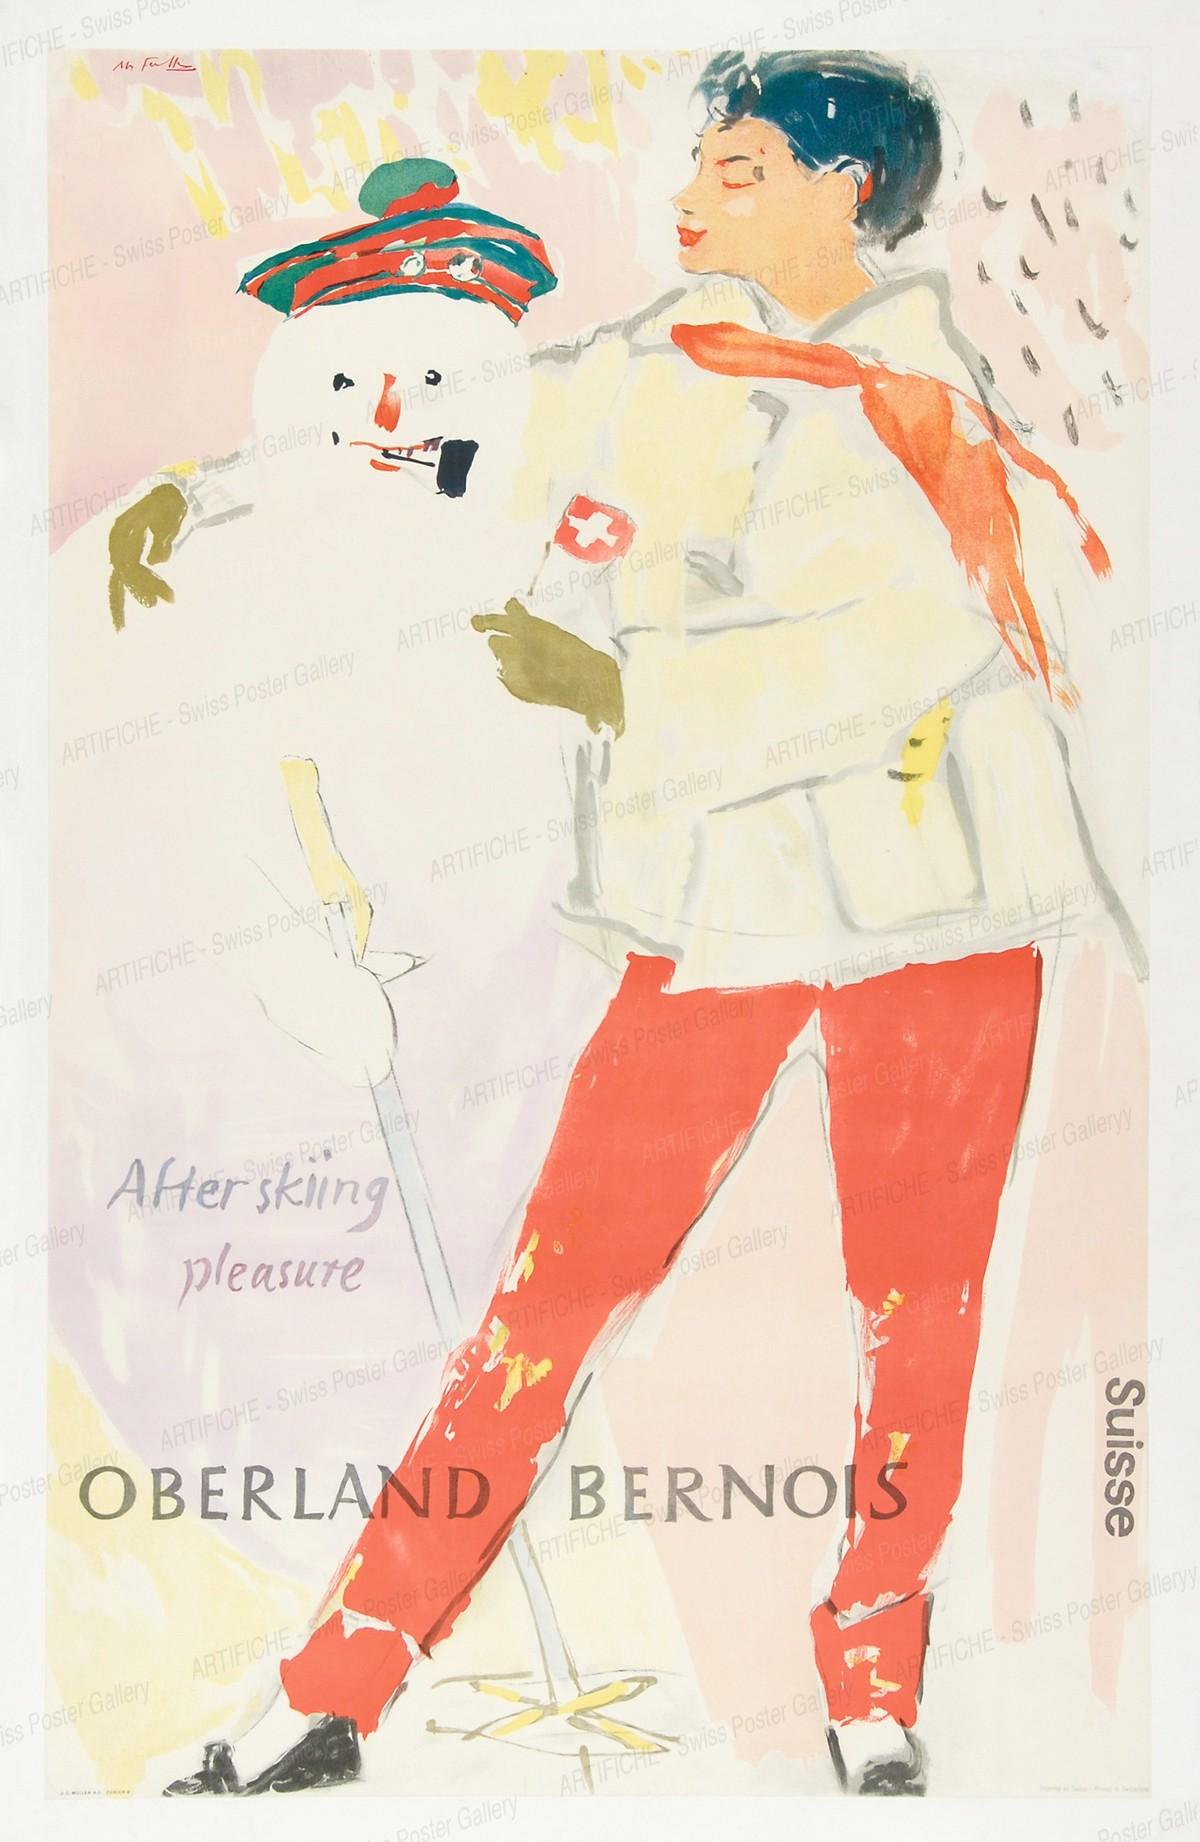 OBERLAND BERNOIS – Suisse – After skiing pleasure, Hans Falk